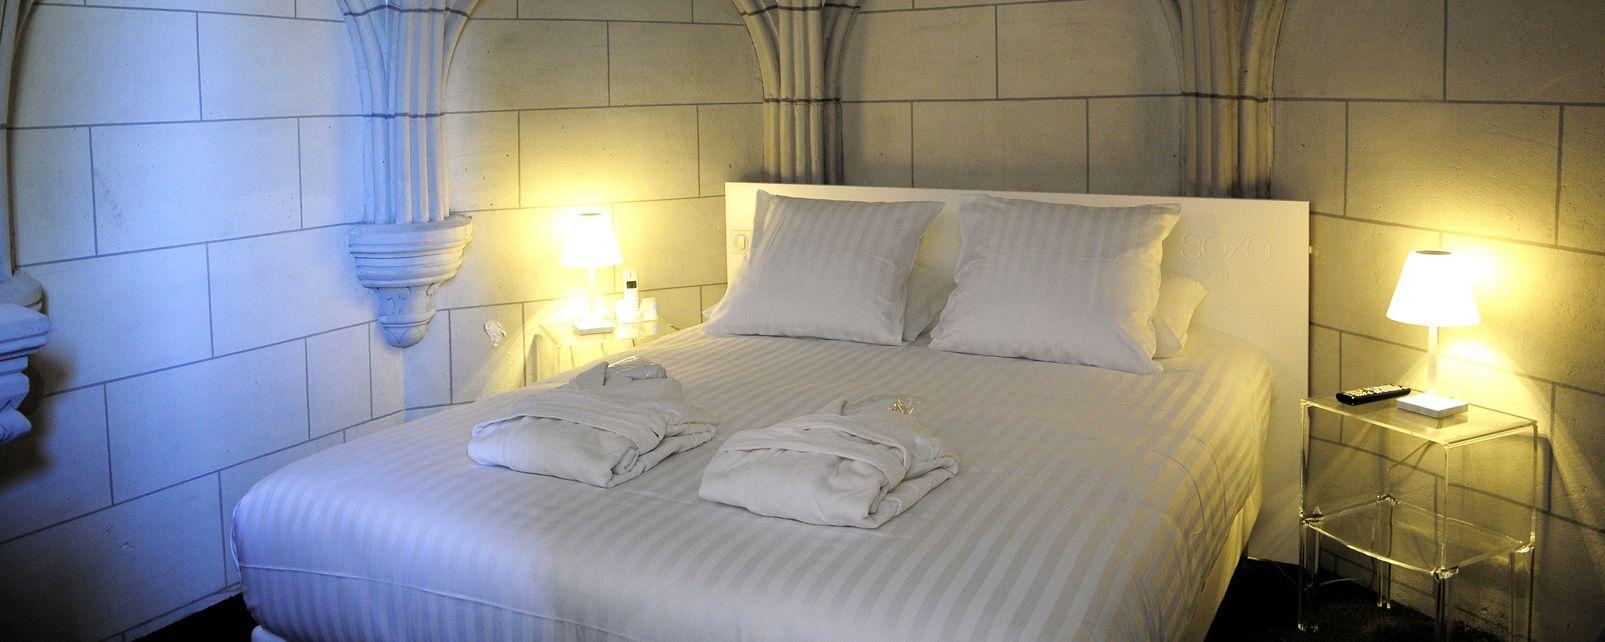 Hotel Sozo Hotel